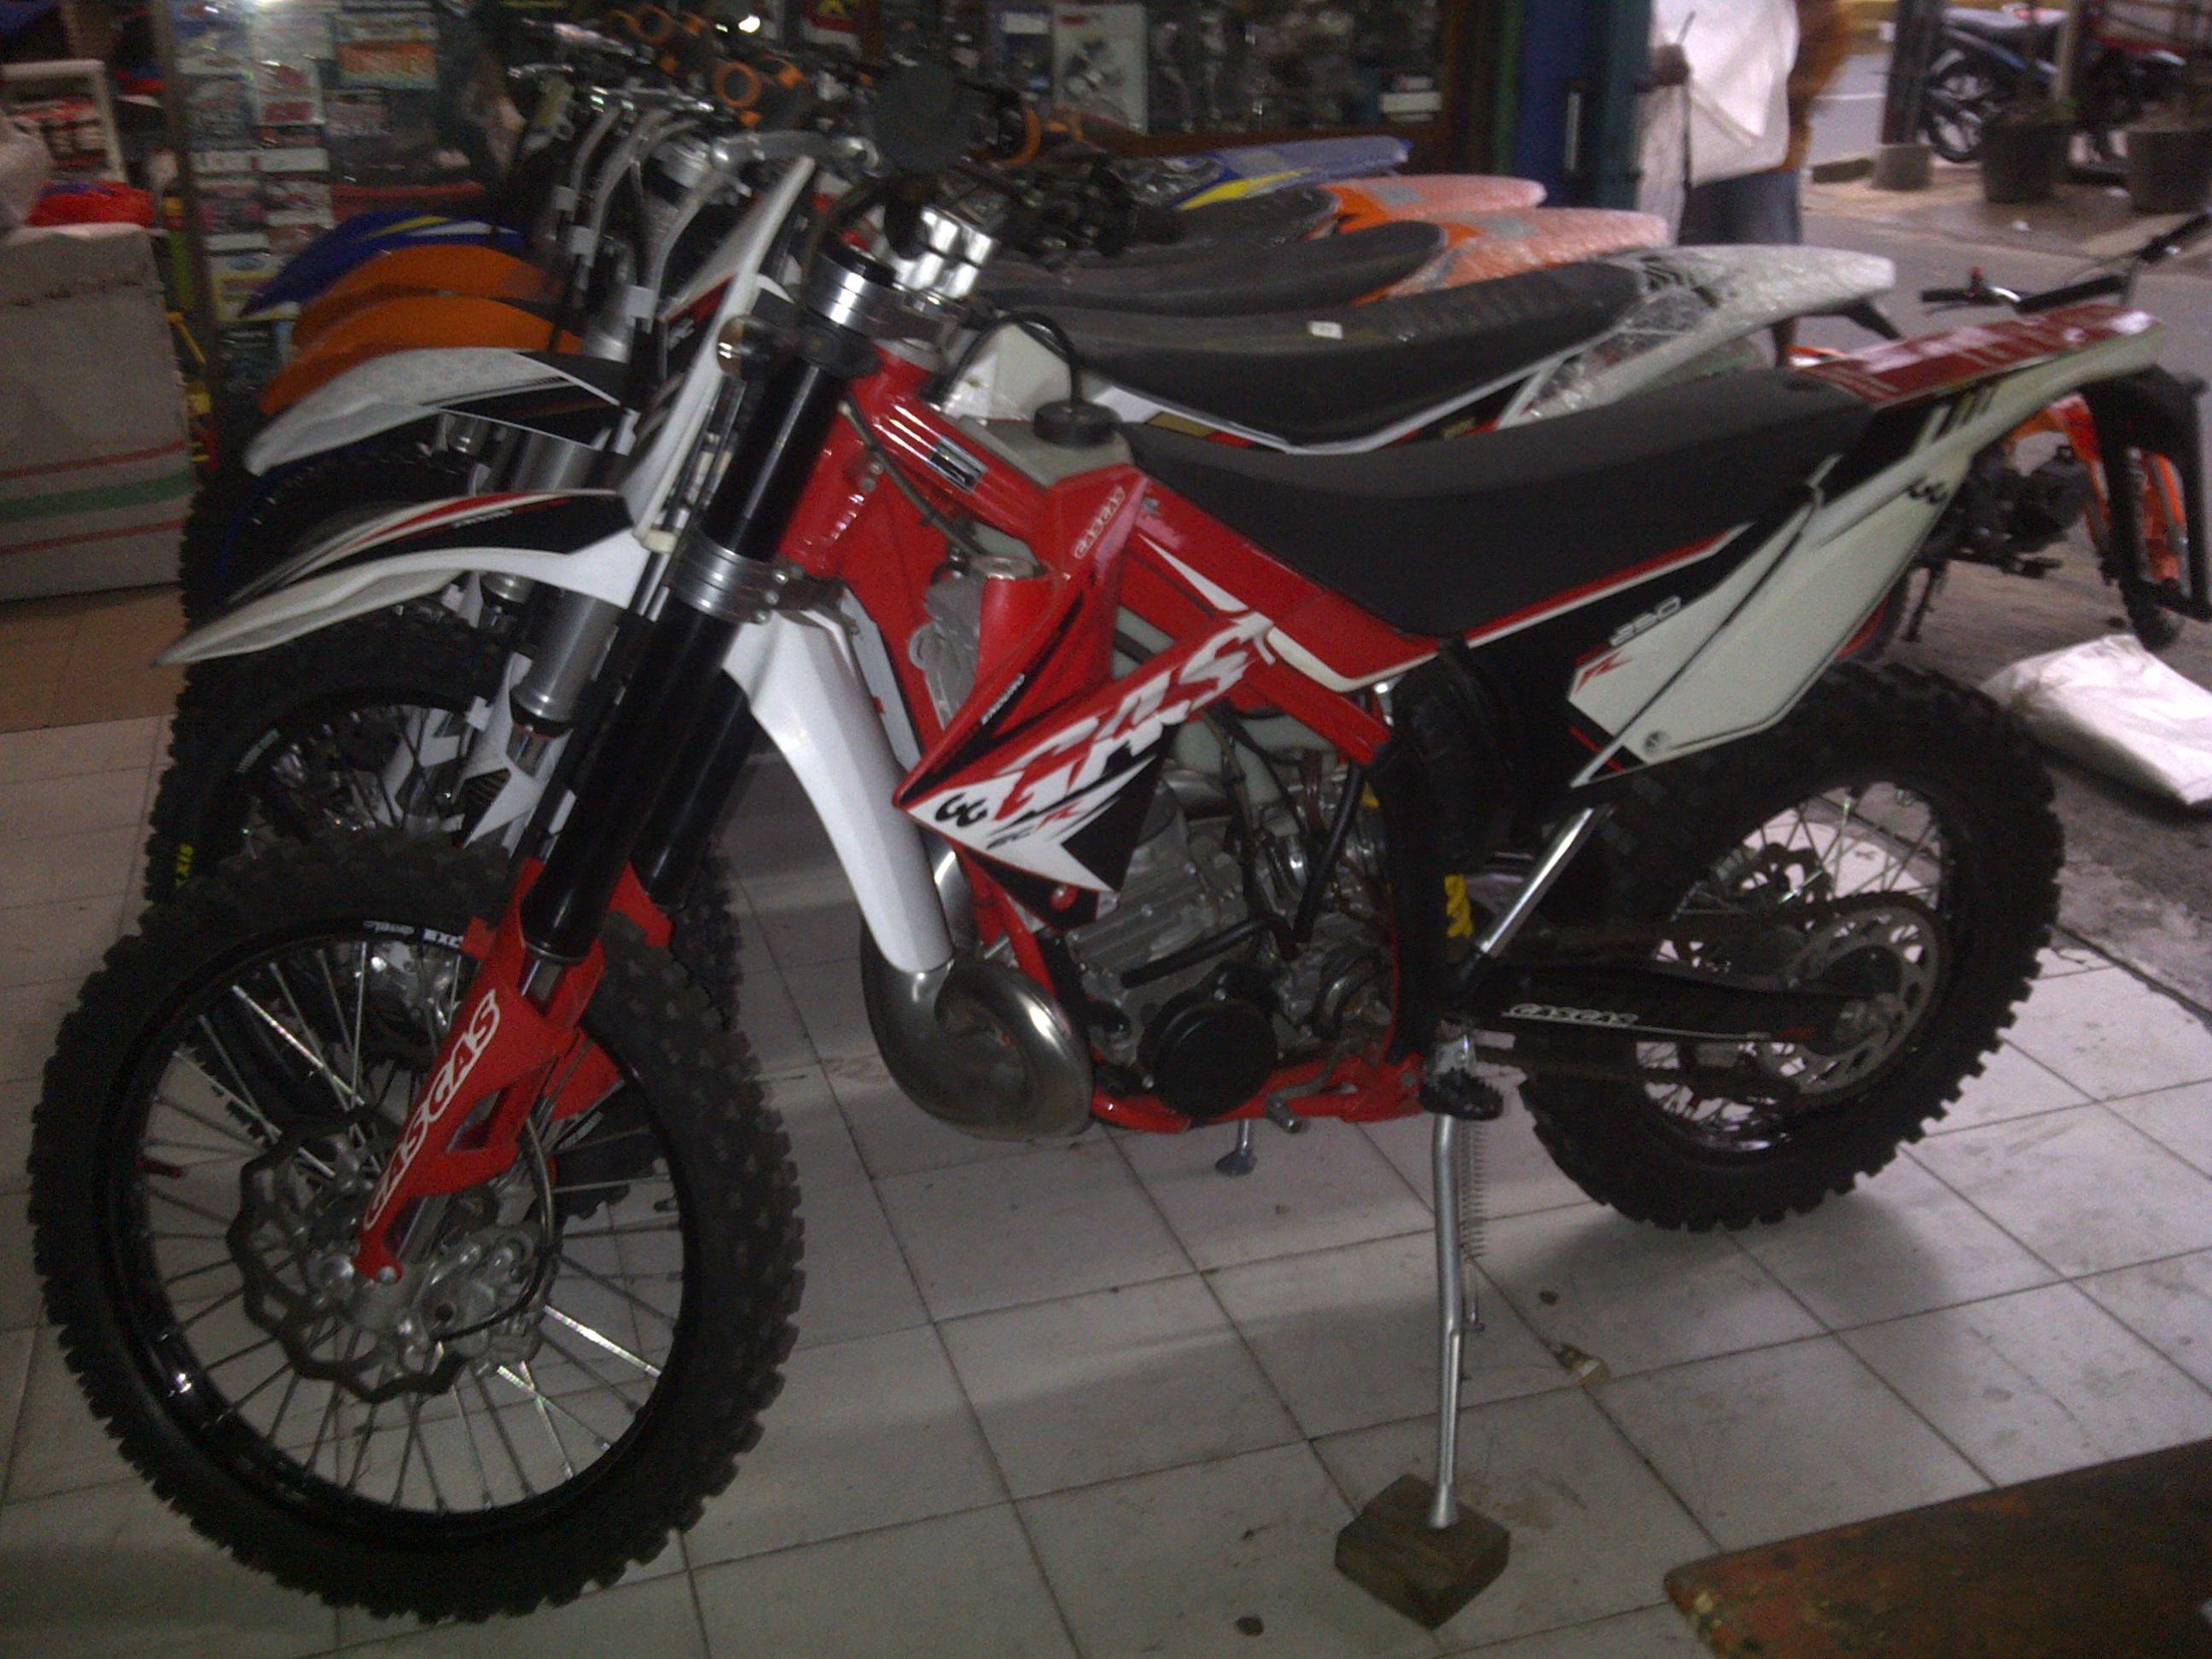 IMG 20130323 00094 Jual motor TRAIL GAS GAS ECR 250cc